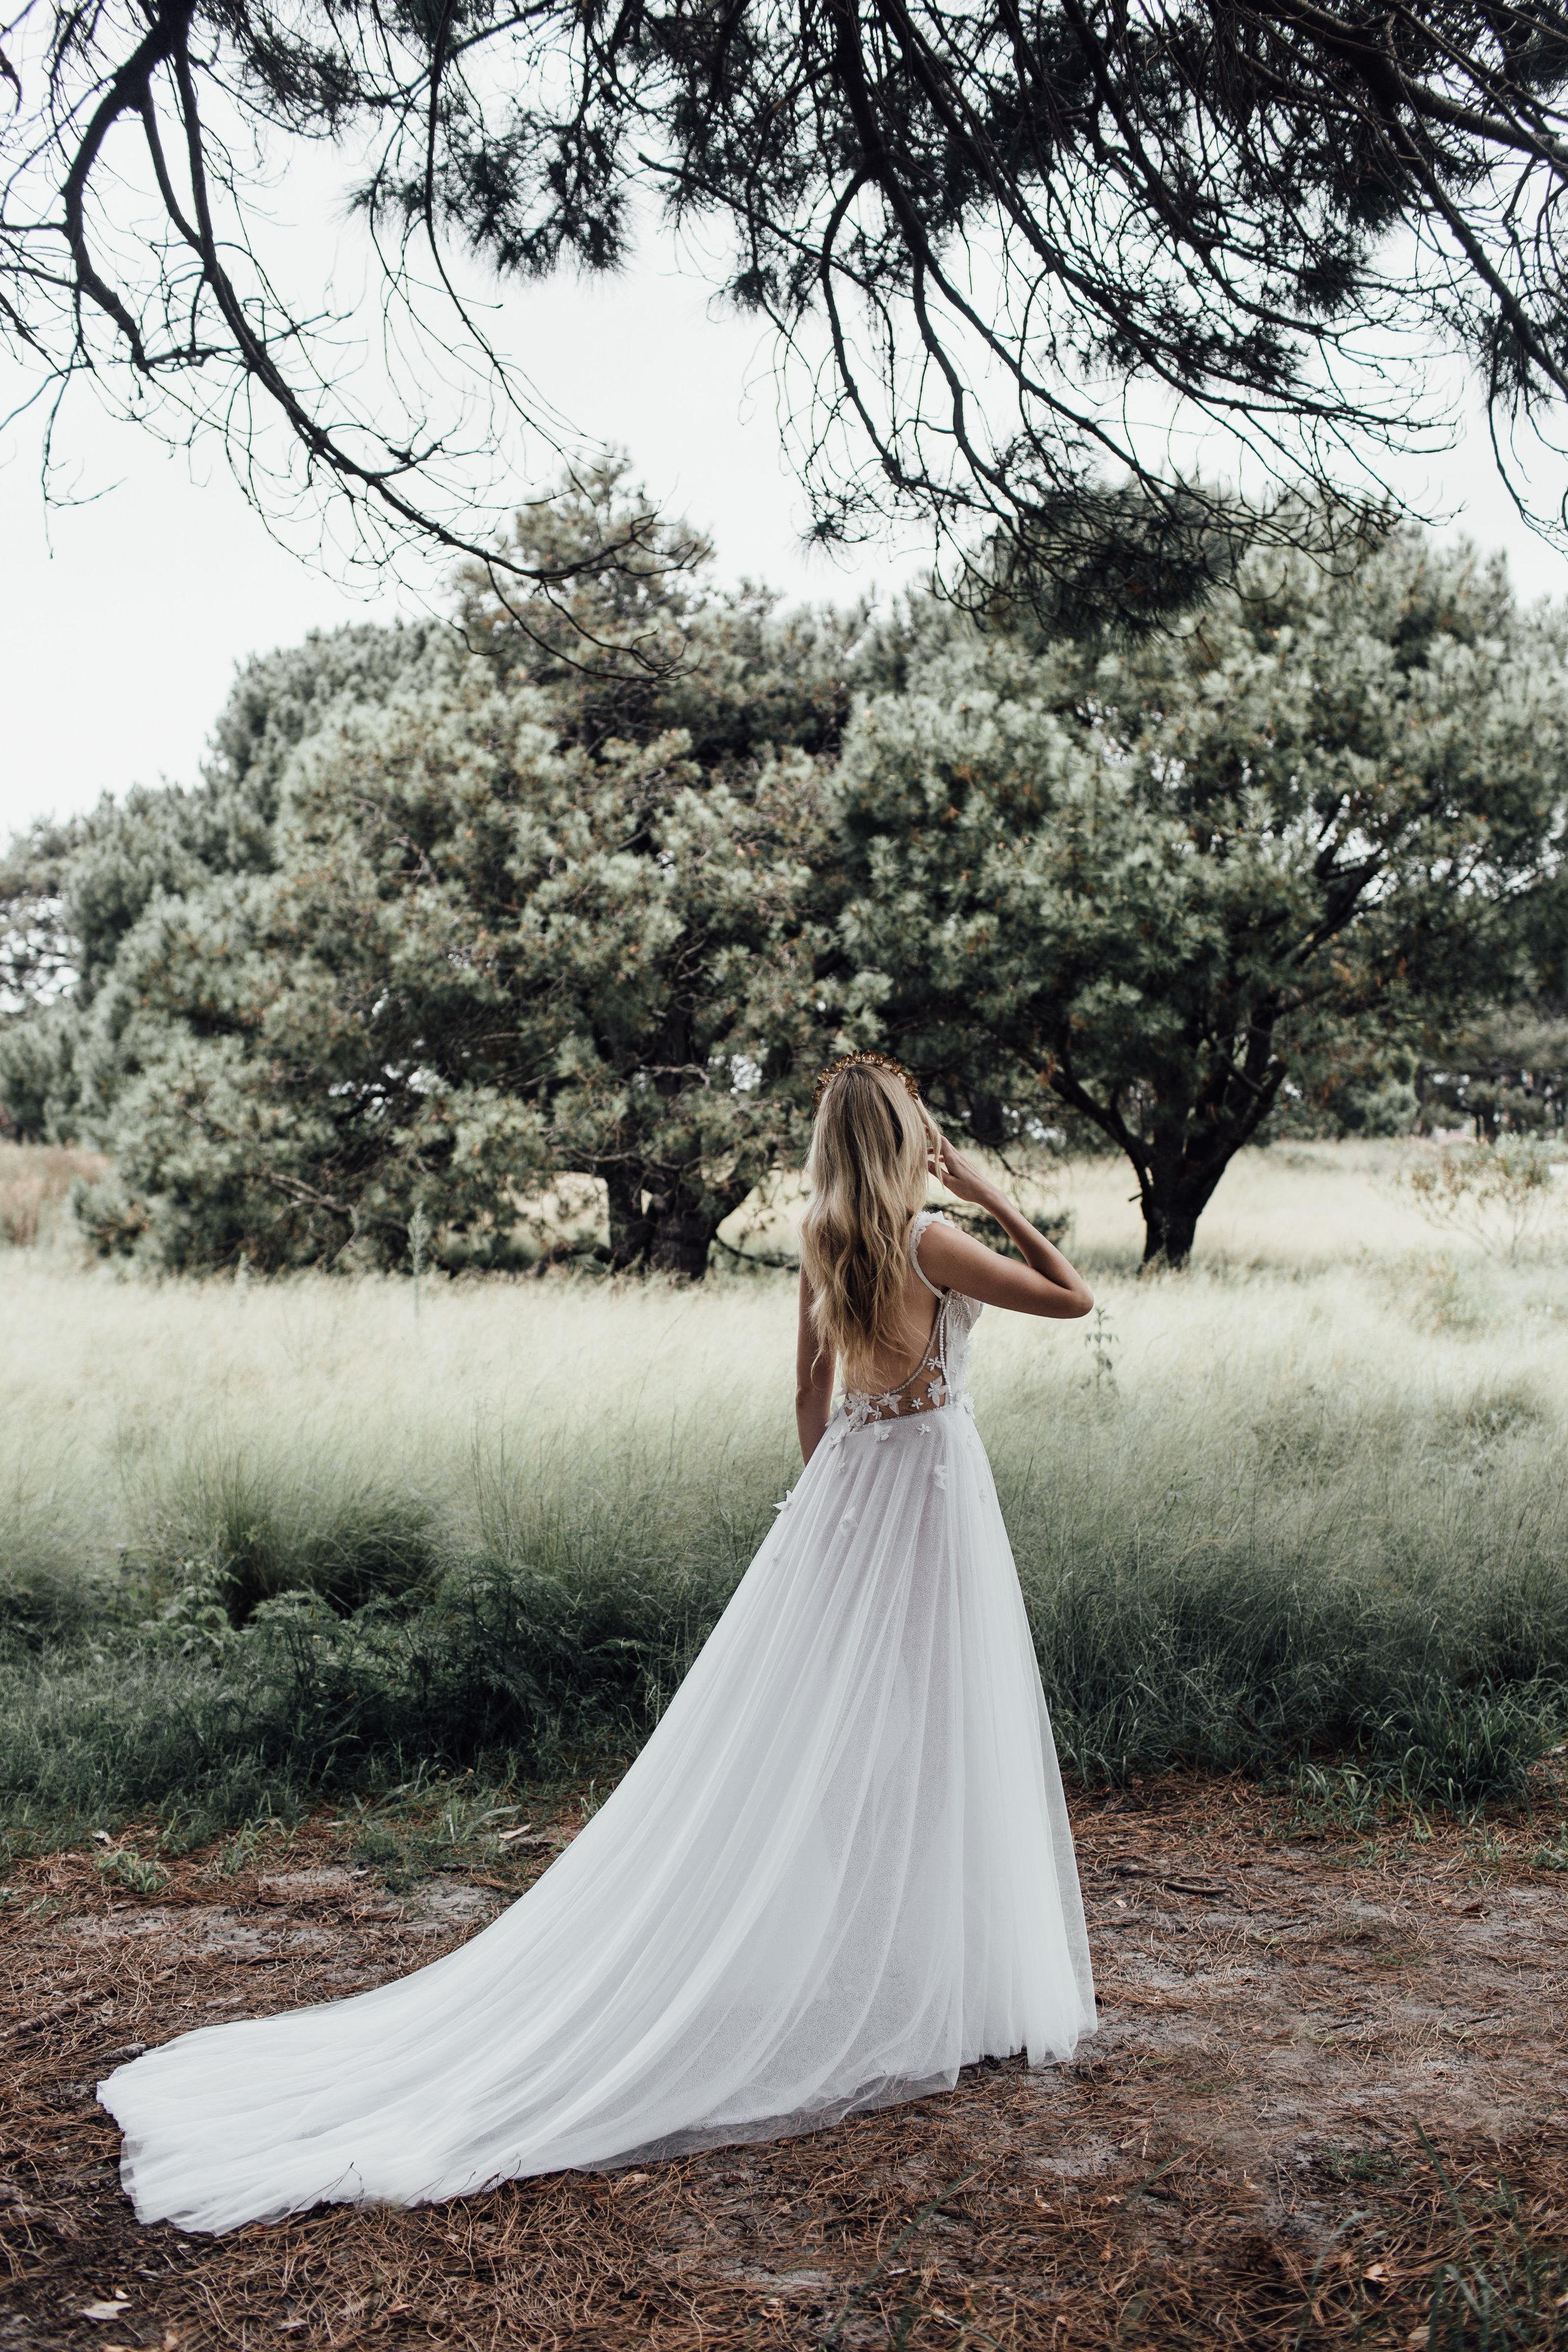 Ivonn-Couture-Eden-Couture-Collection-129.jpg